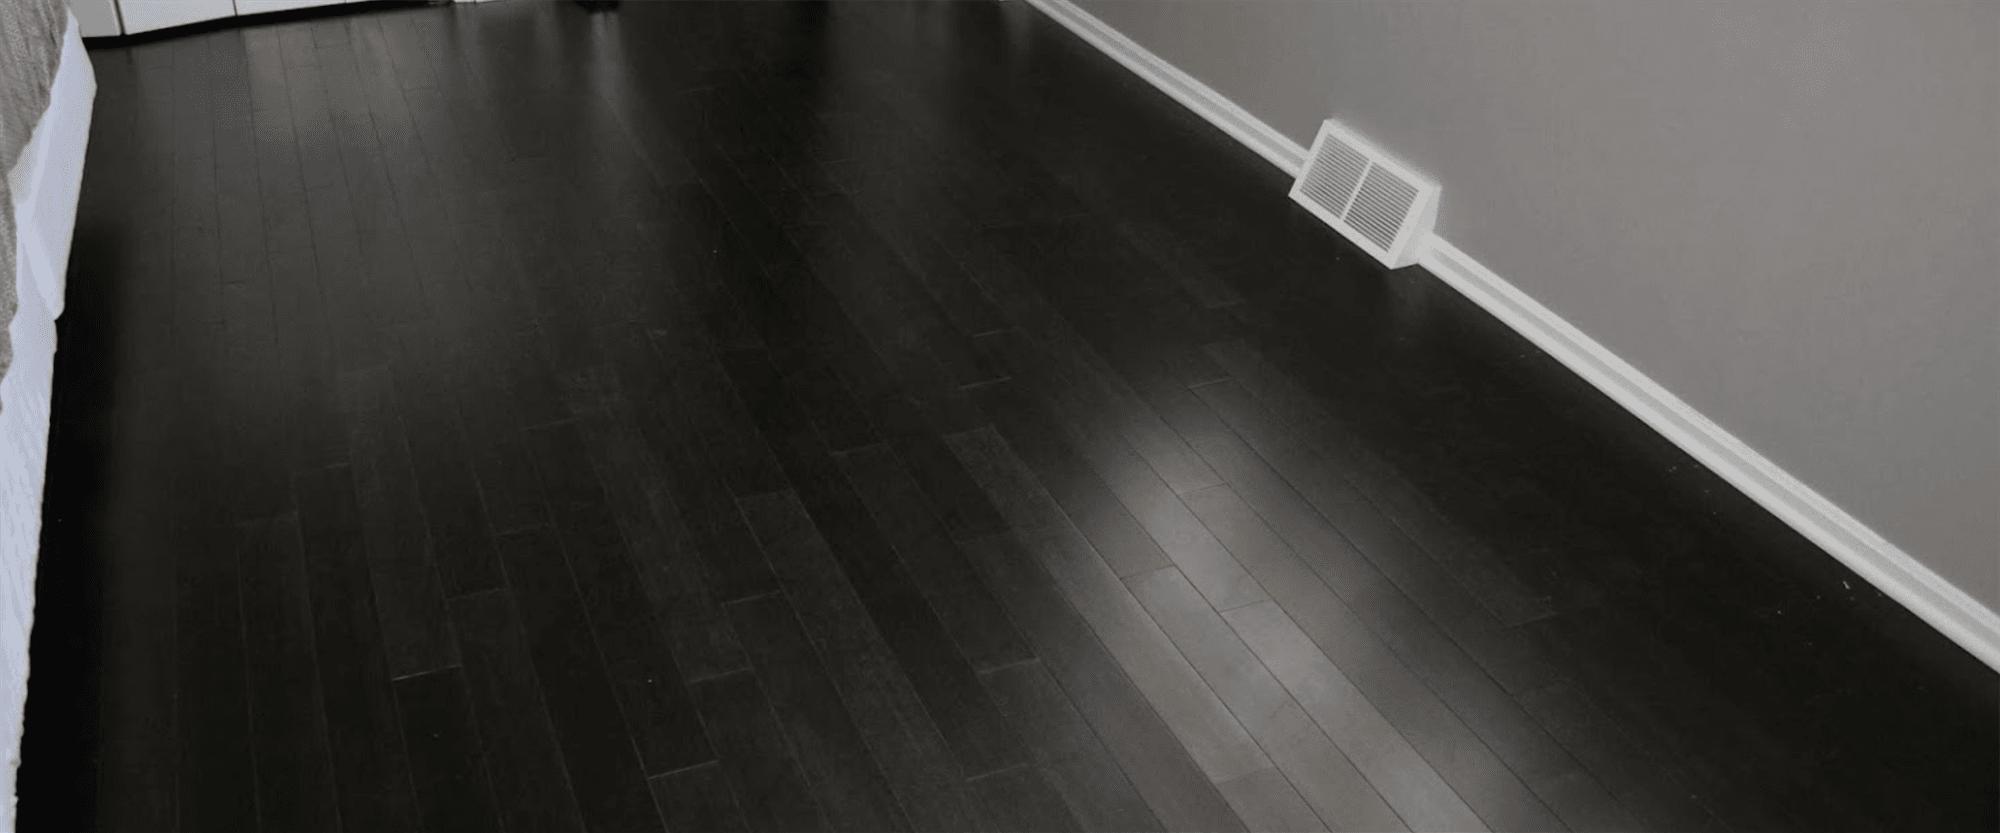 Hardwood Flooring from Floorz in Strongsville, OH